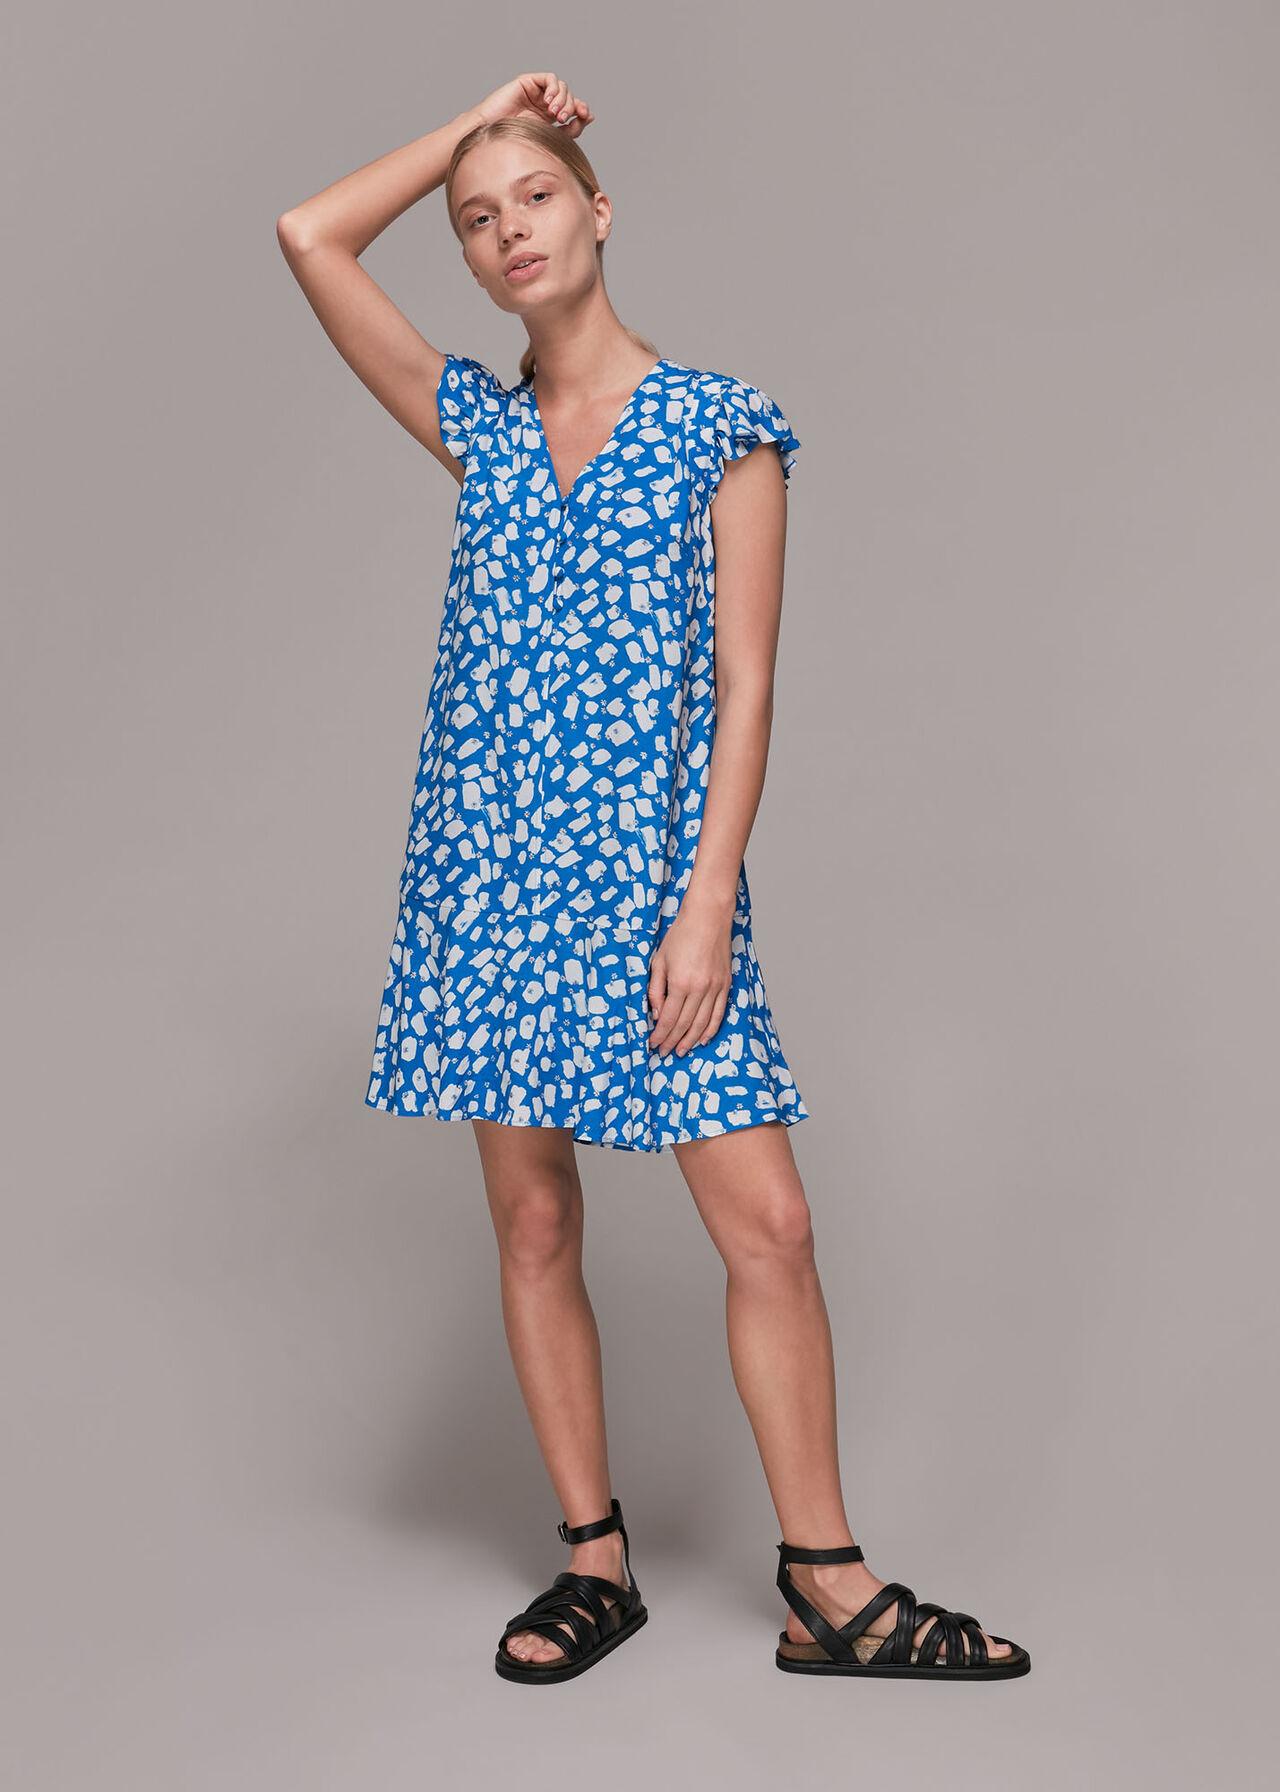 Brushmark Daisy Print Dress